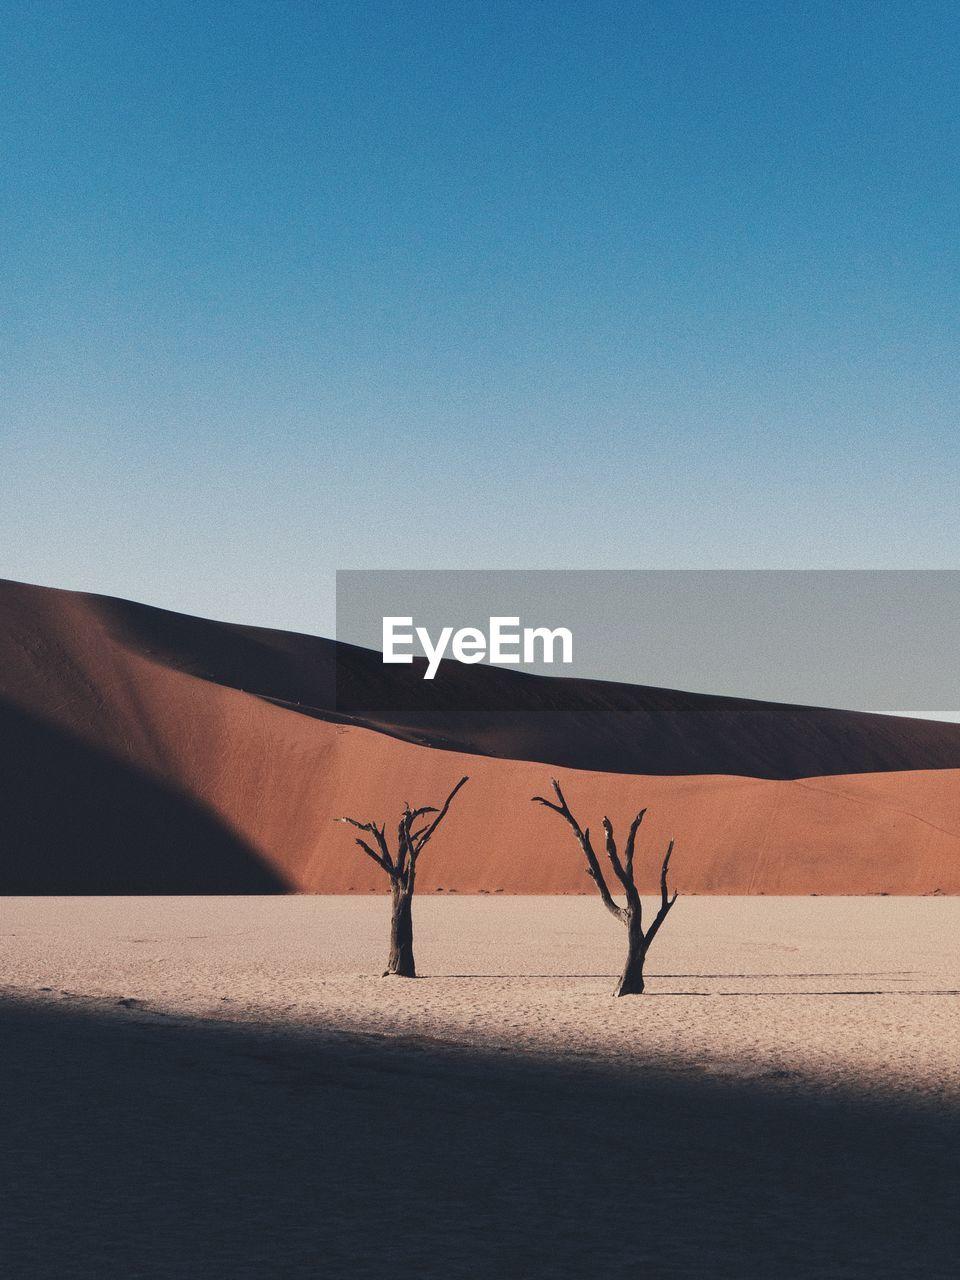 Bare Trees On Sand At Desert Against Clear Sky